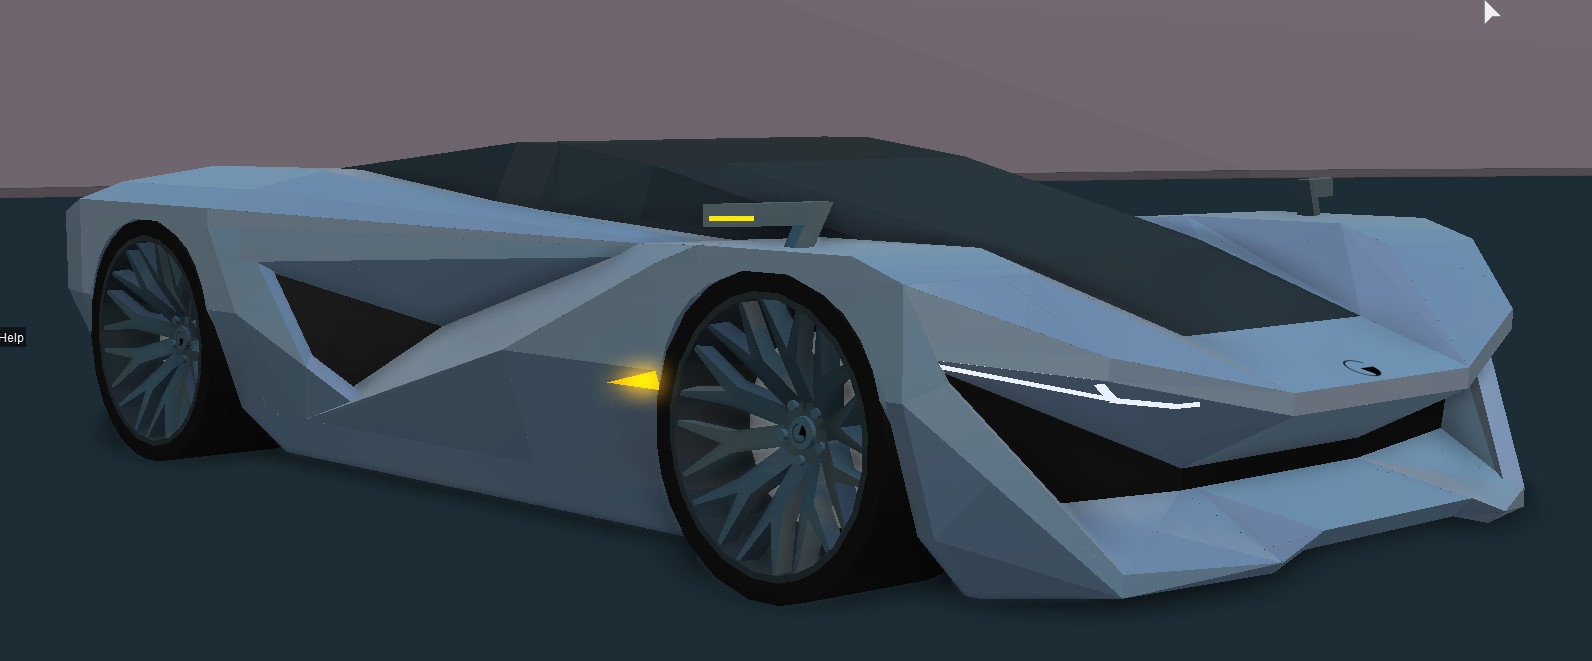 grandeur automobiles esteem roblox vehicles wiki fandom powered